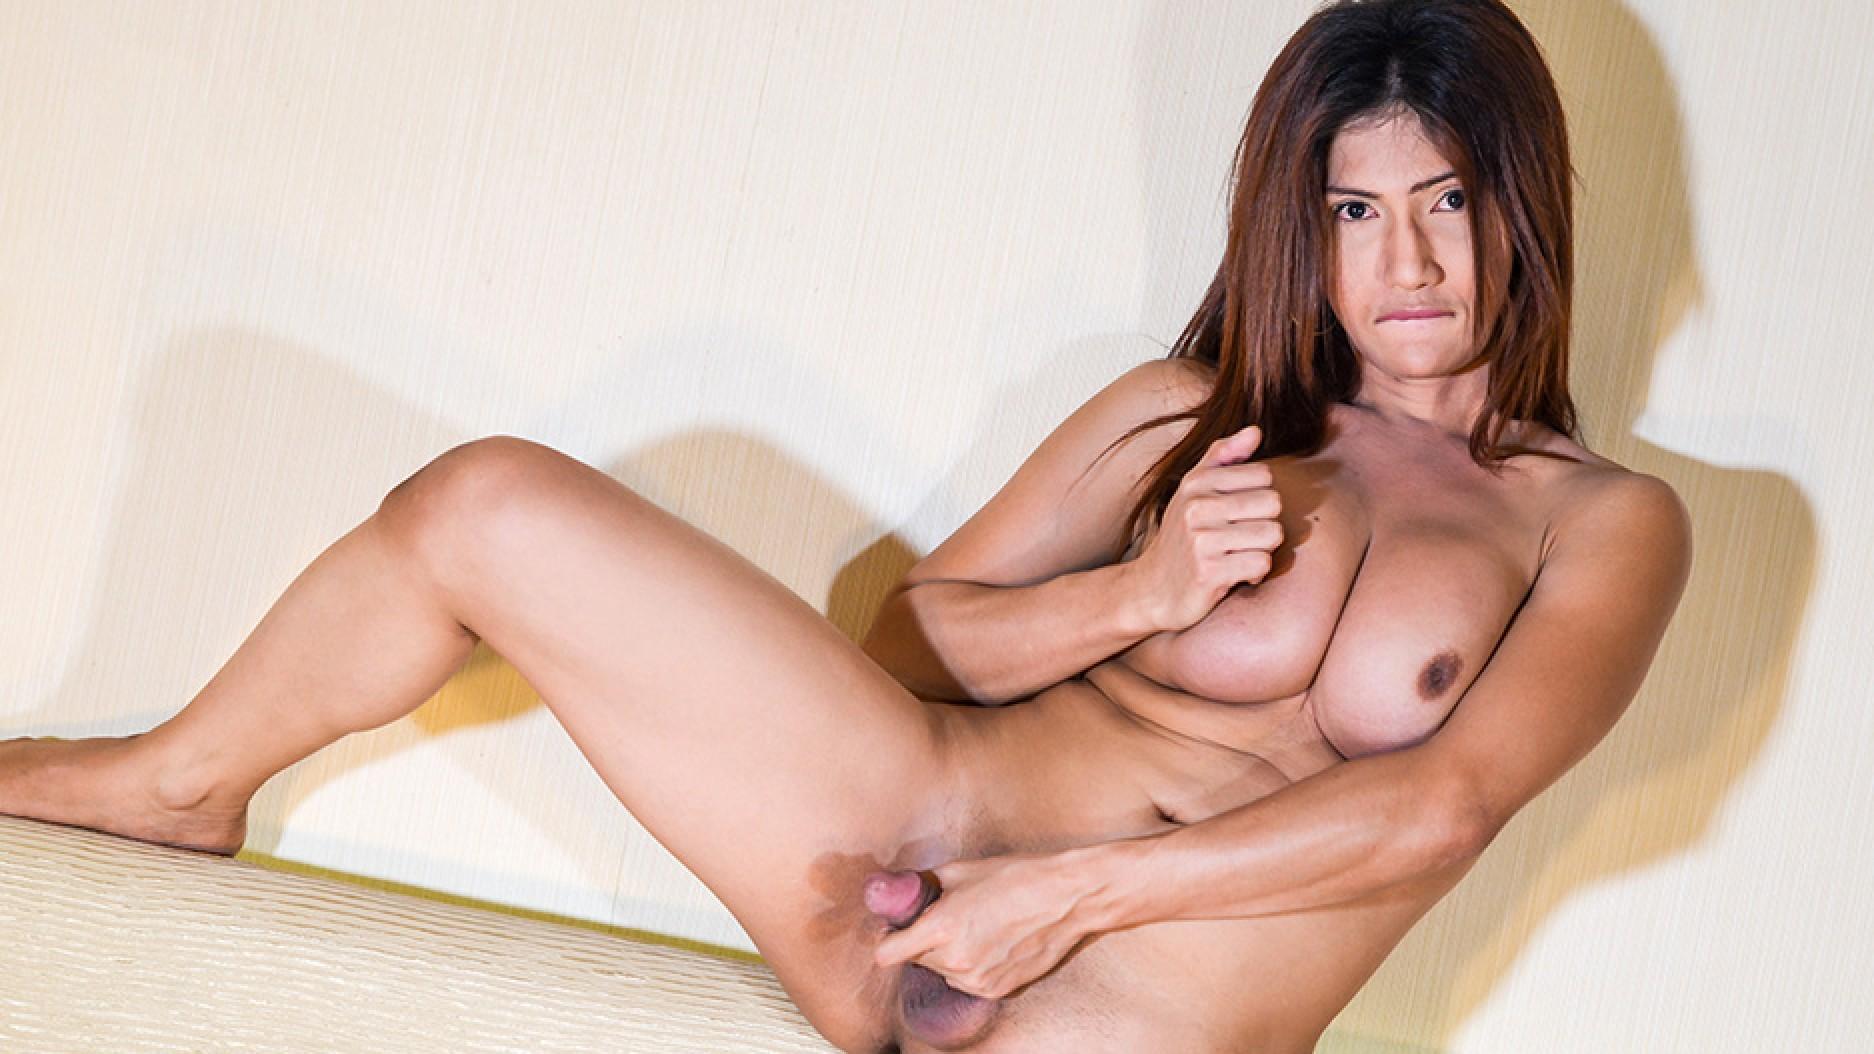 1_Ladyboy-ladyboy_presents_Pauline_Diaz_Jacks_Her_Cock__-_05.01.2017.jpg